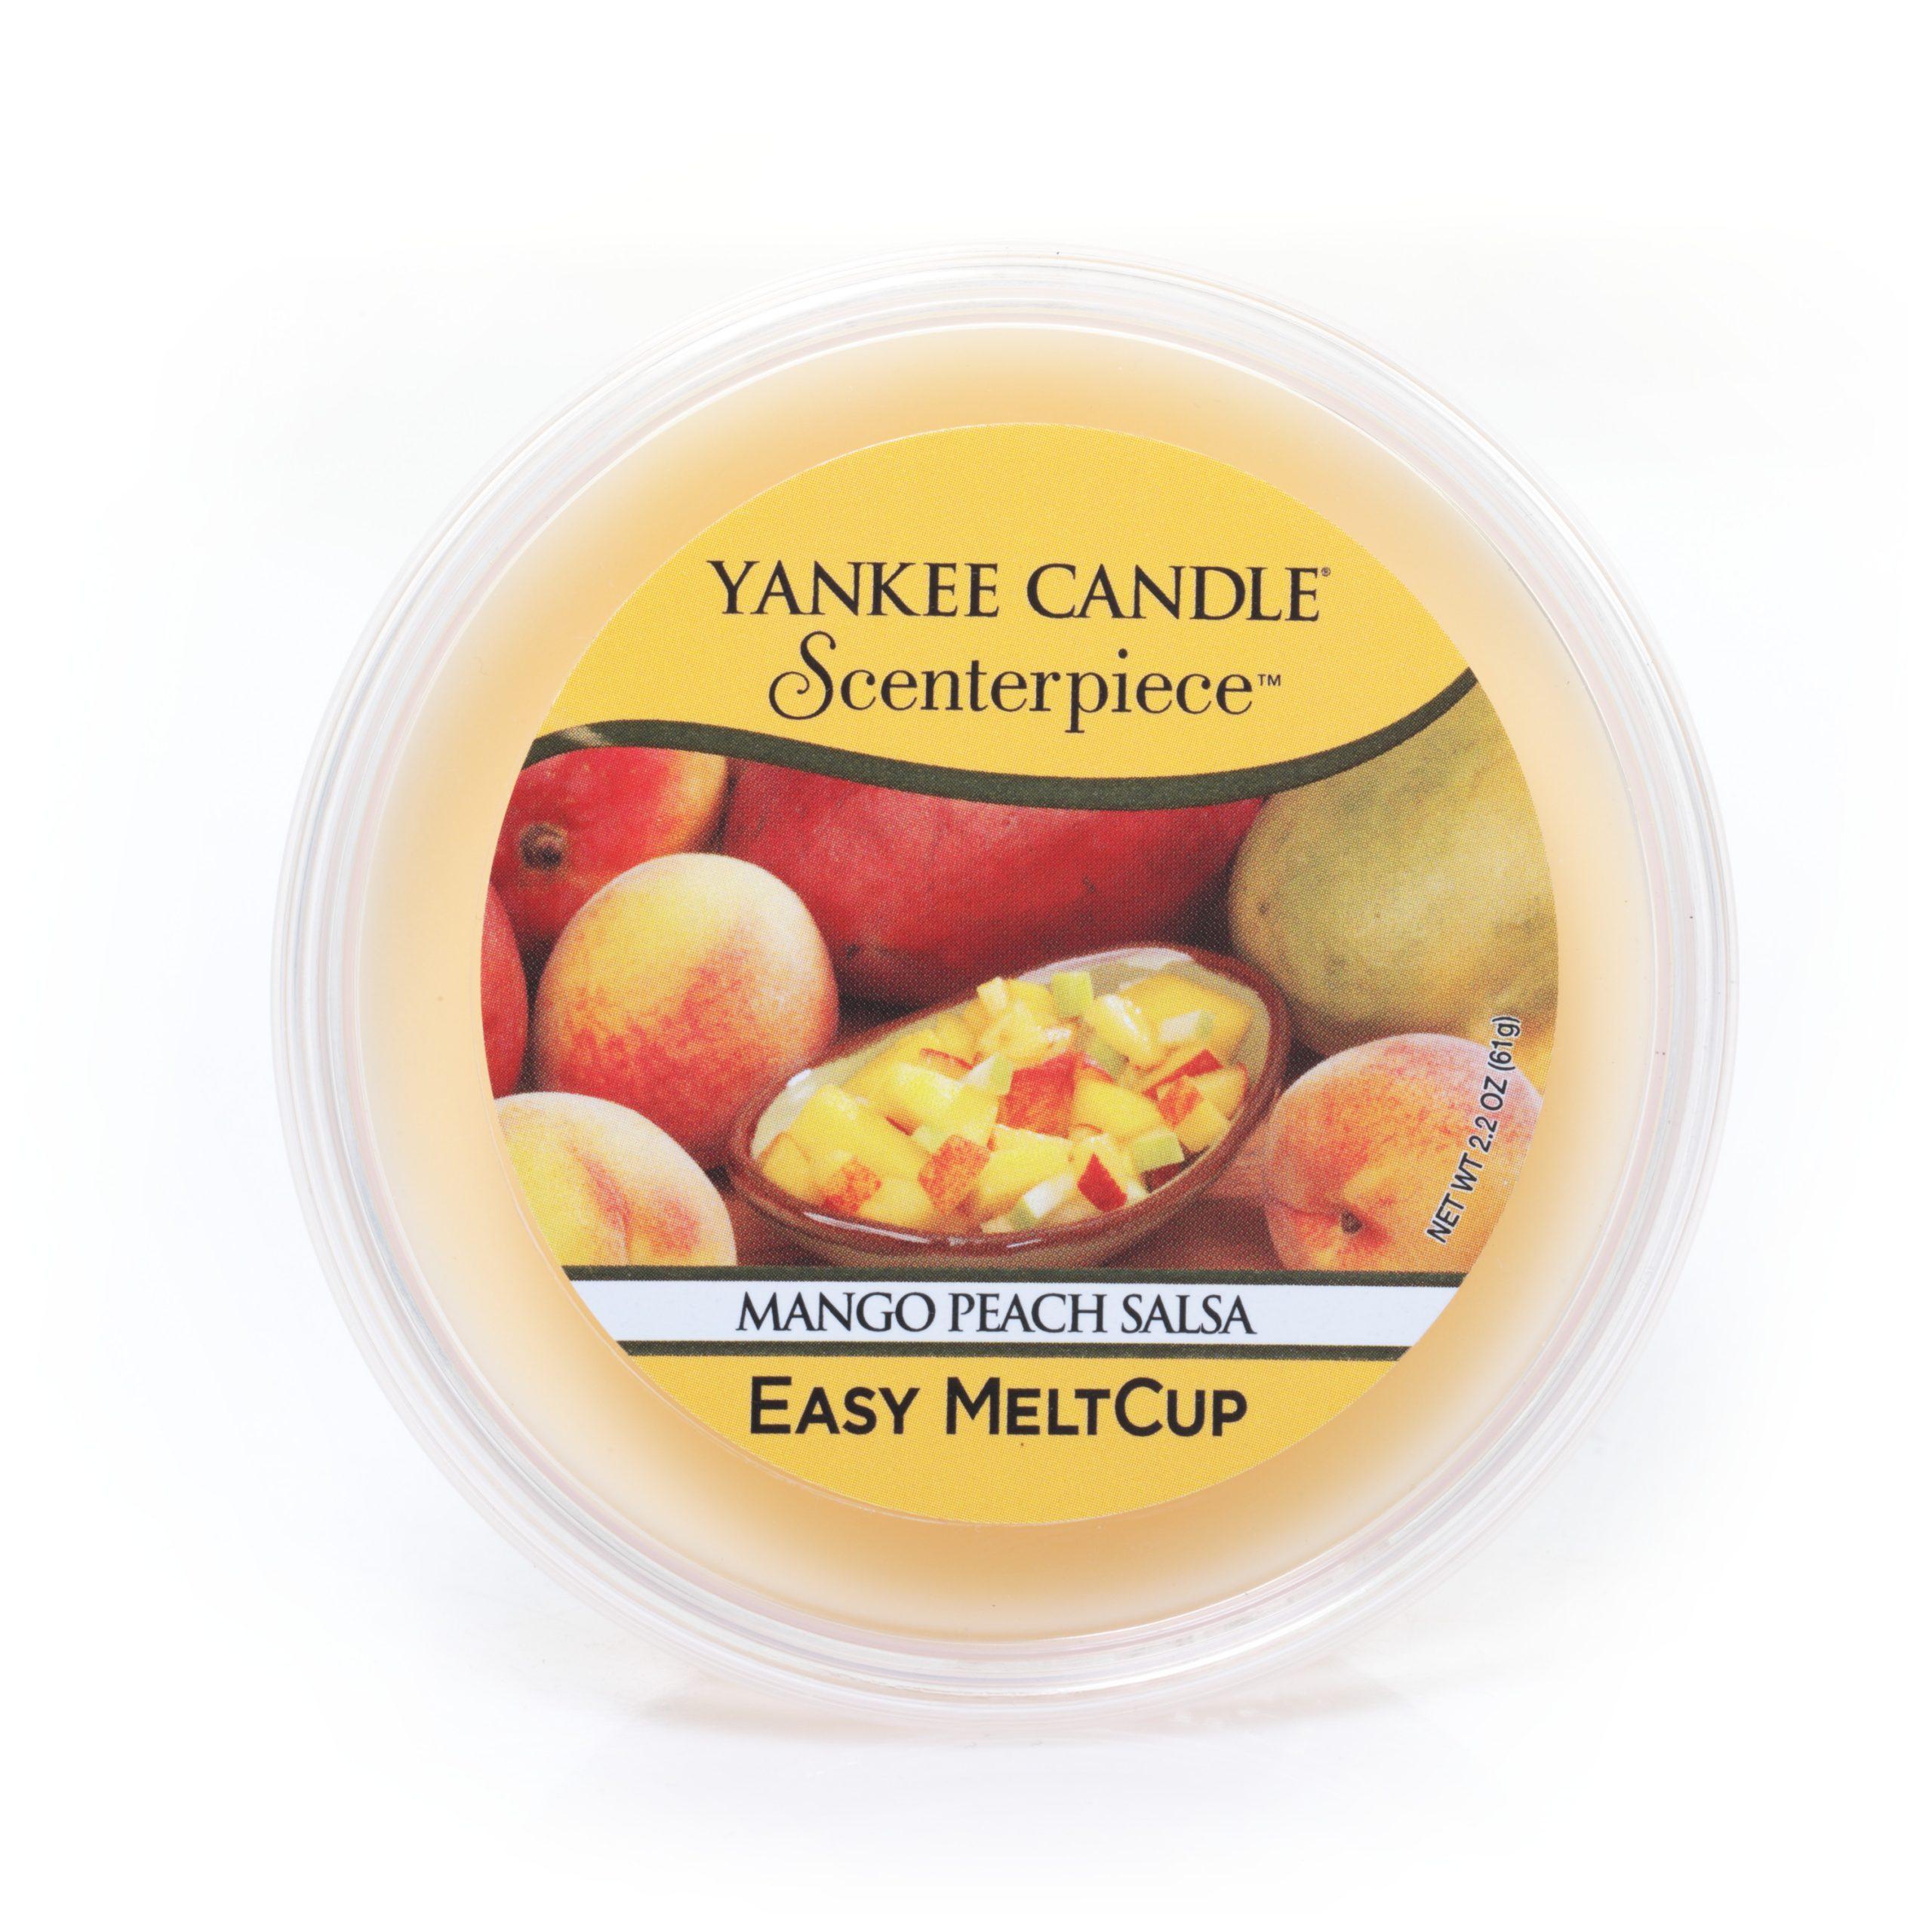 Mango Peach Salsa Scenterpiece Melt Cups